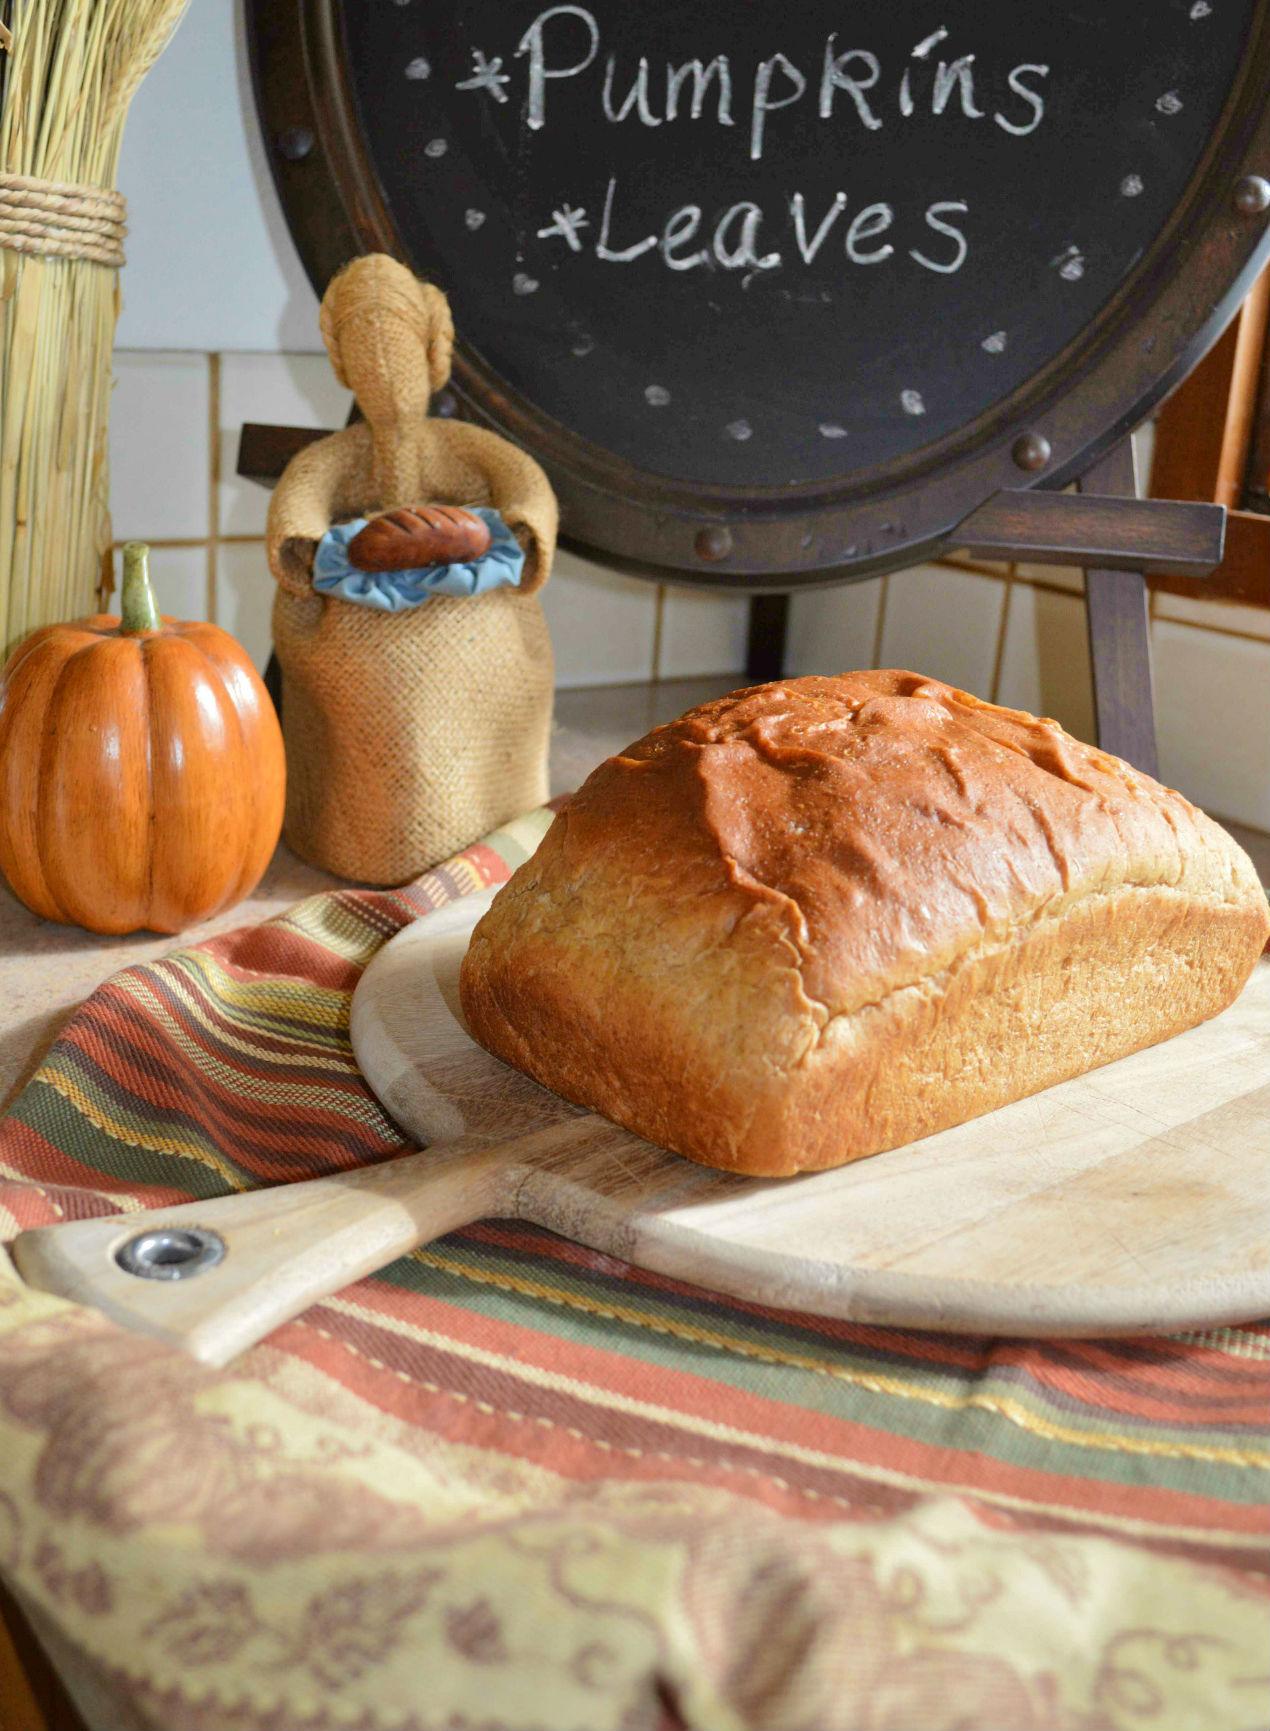 Swedish Rye bread goodness...